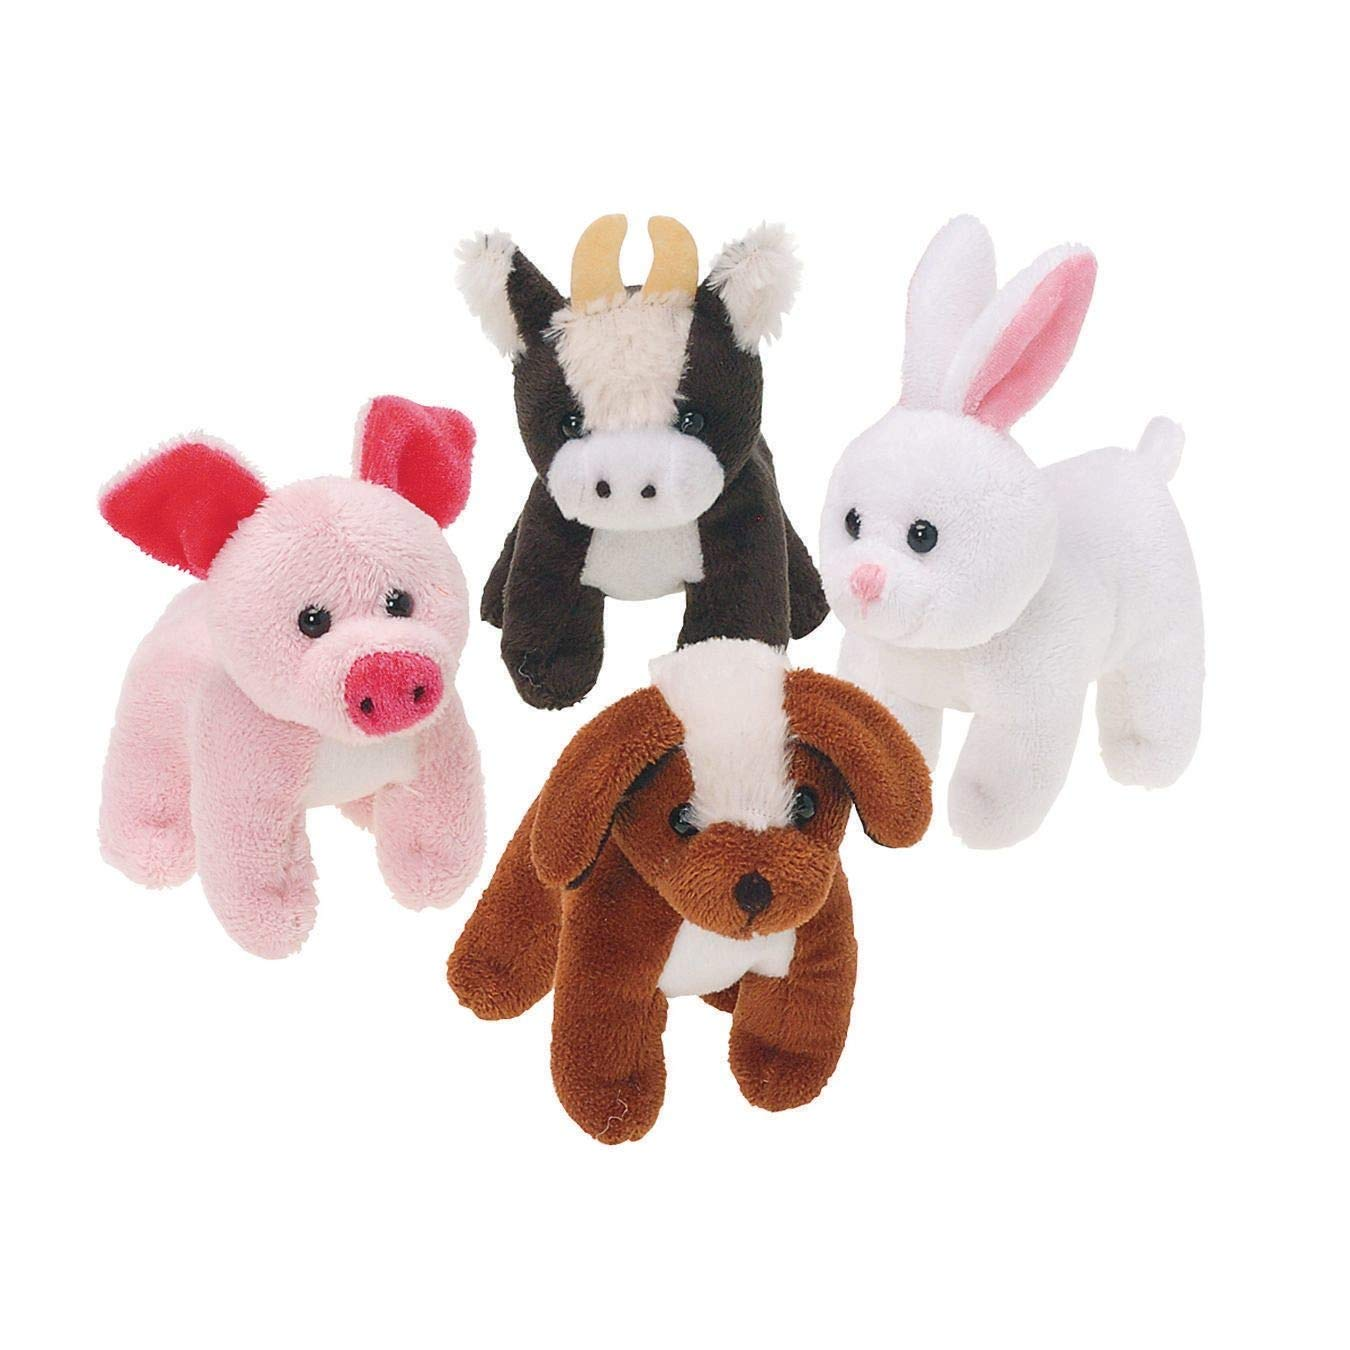 Amazon Com U S Toy Plush Furry Farm Animals Assorted 12 Each Set Industrial Scientific